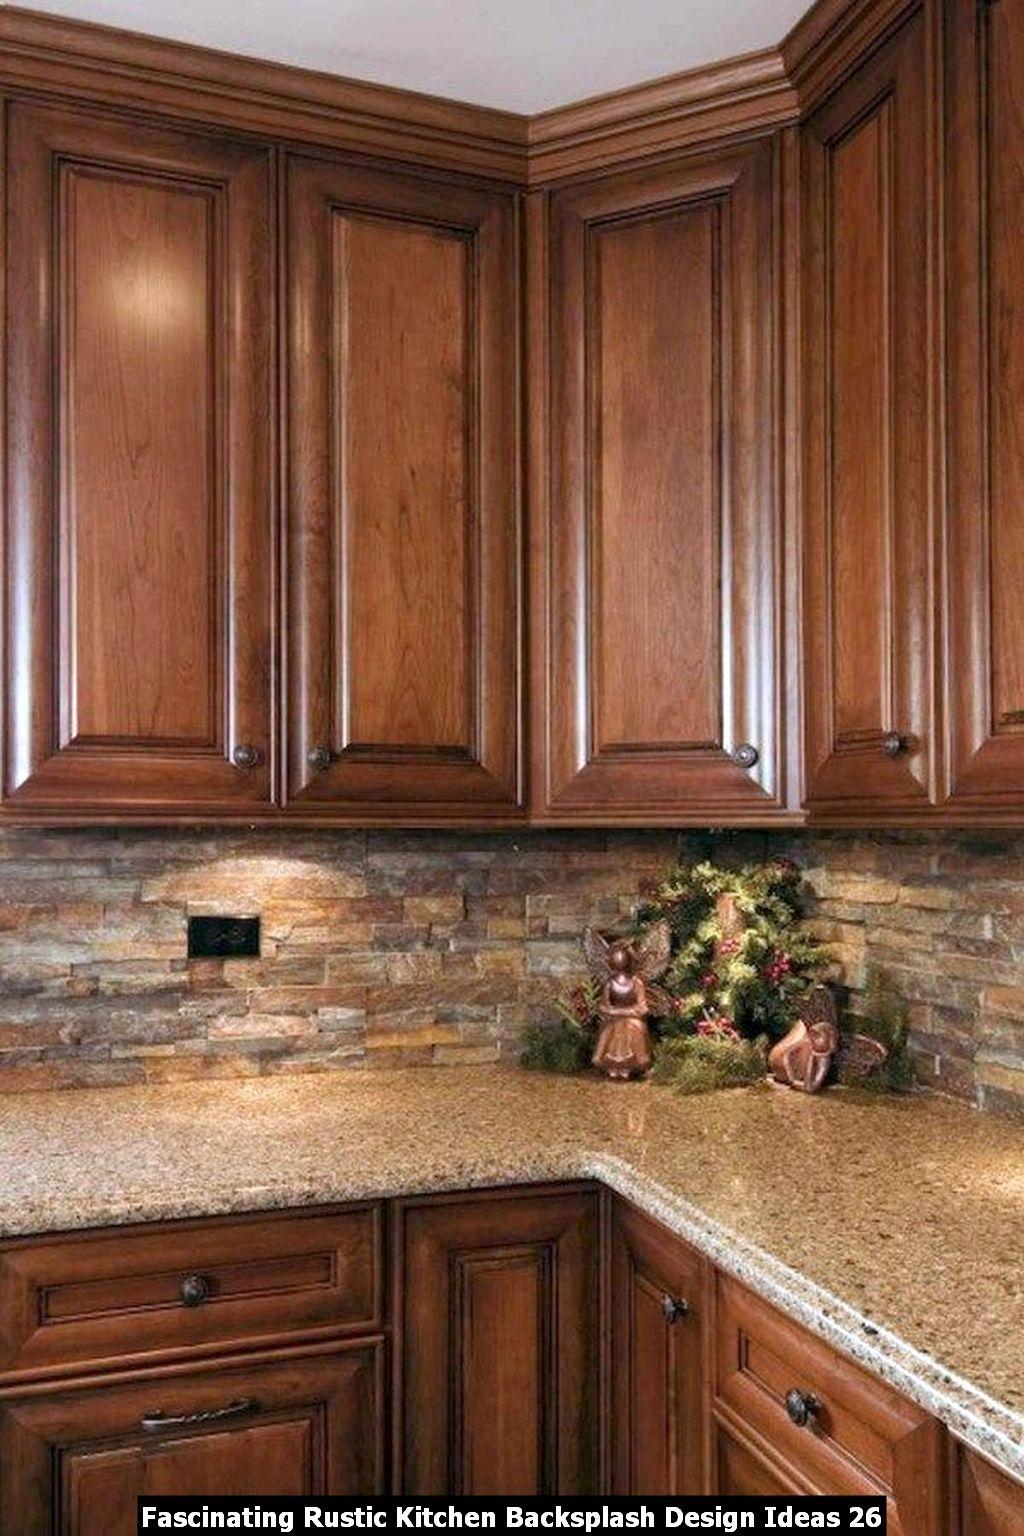 Fascinating Rustic Kitchen Backsplash Design Ideas 26